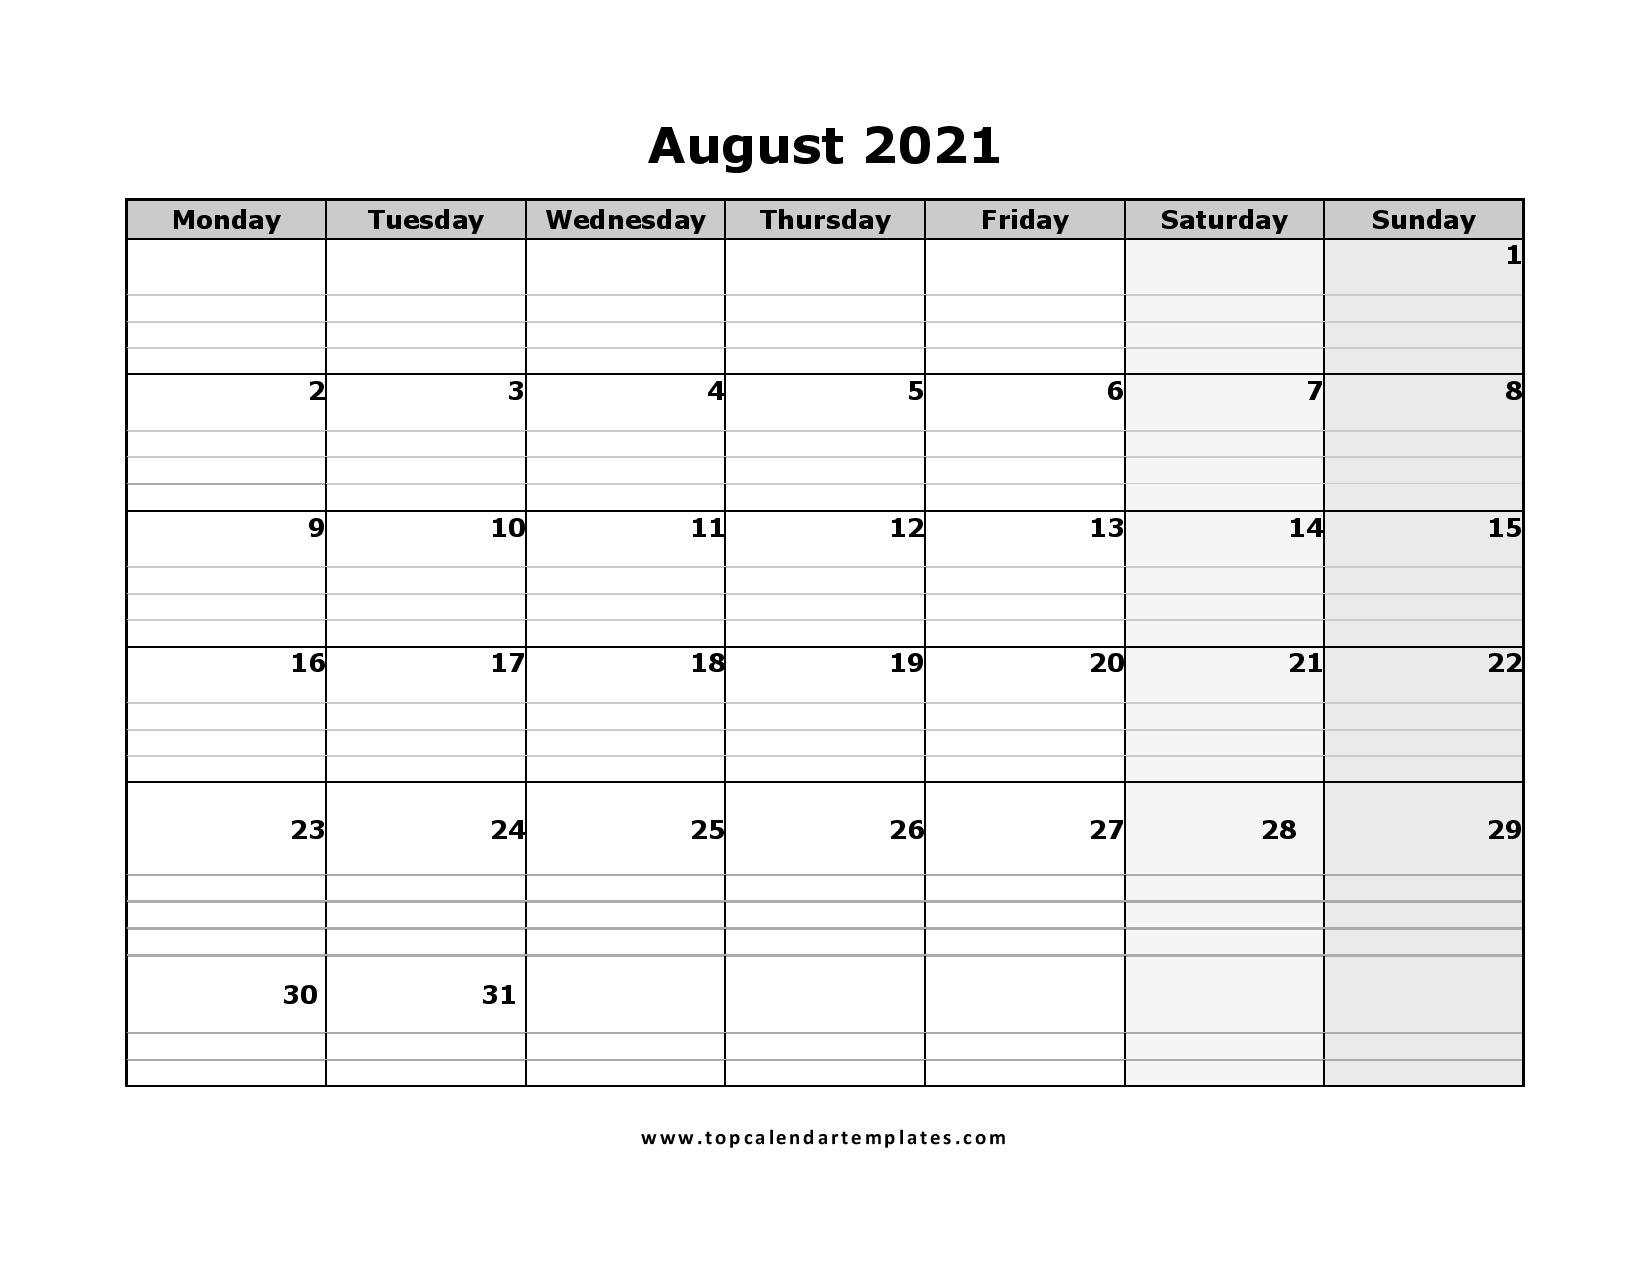 Free August 2021 Calendar Printable - Blank Templates August 2021 Blank Calendar Printable